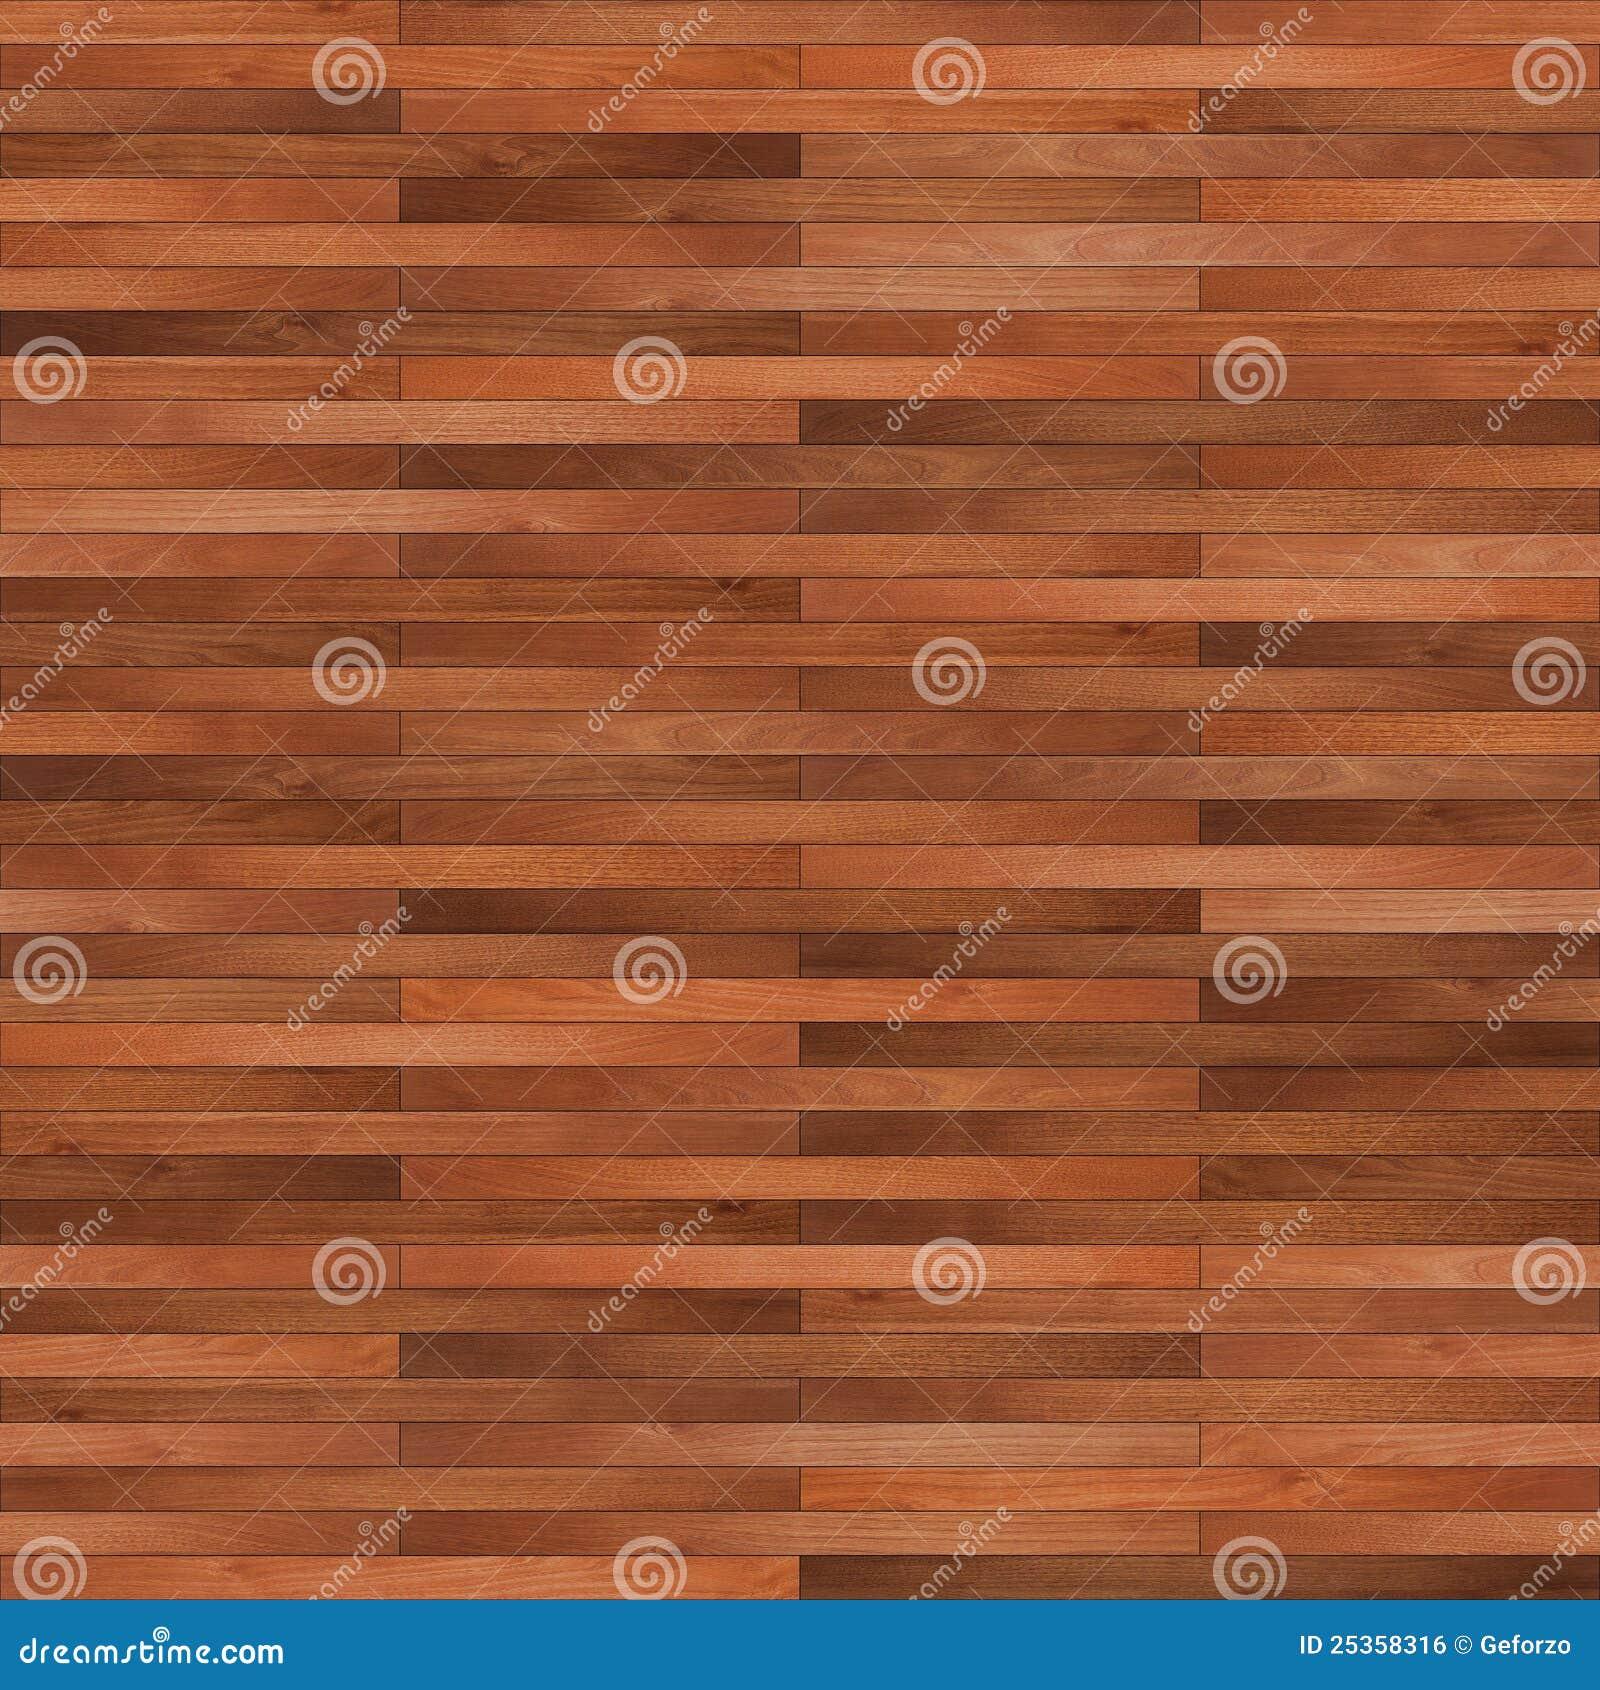 Wood Siding Seamless Texture Aligned Stock Photo Image